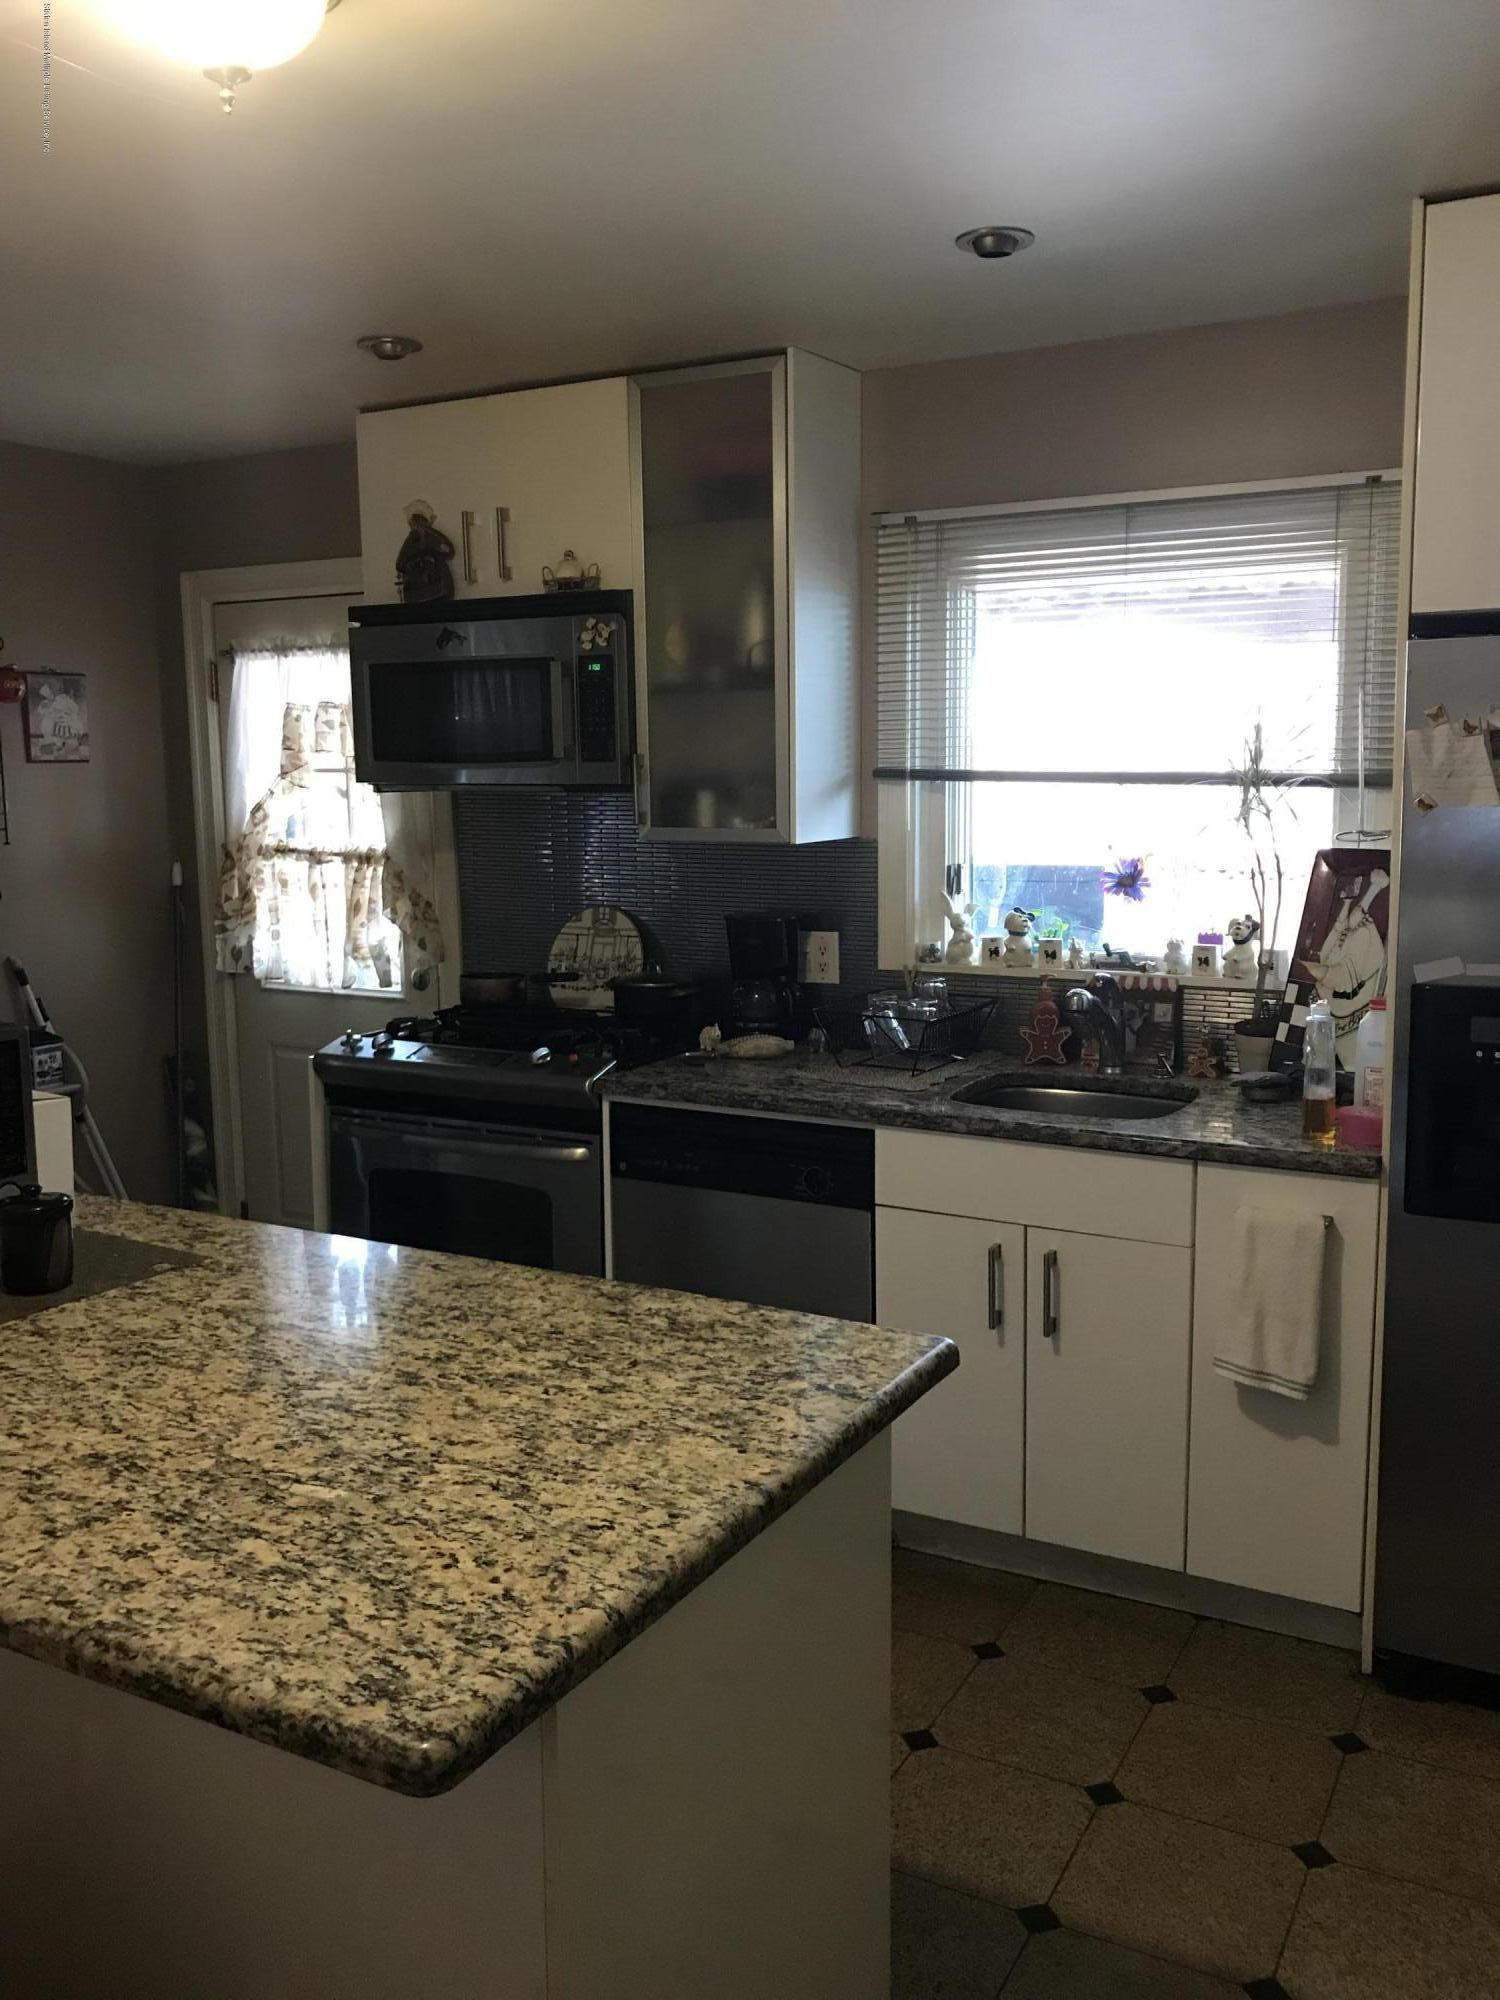 Single Family - Semi-Attached 1097 Arden Avenue  Staten Island, NY 10312, MLS-1131720-3